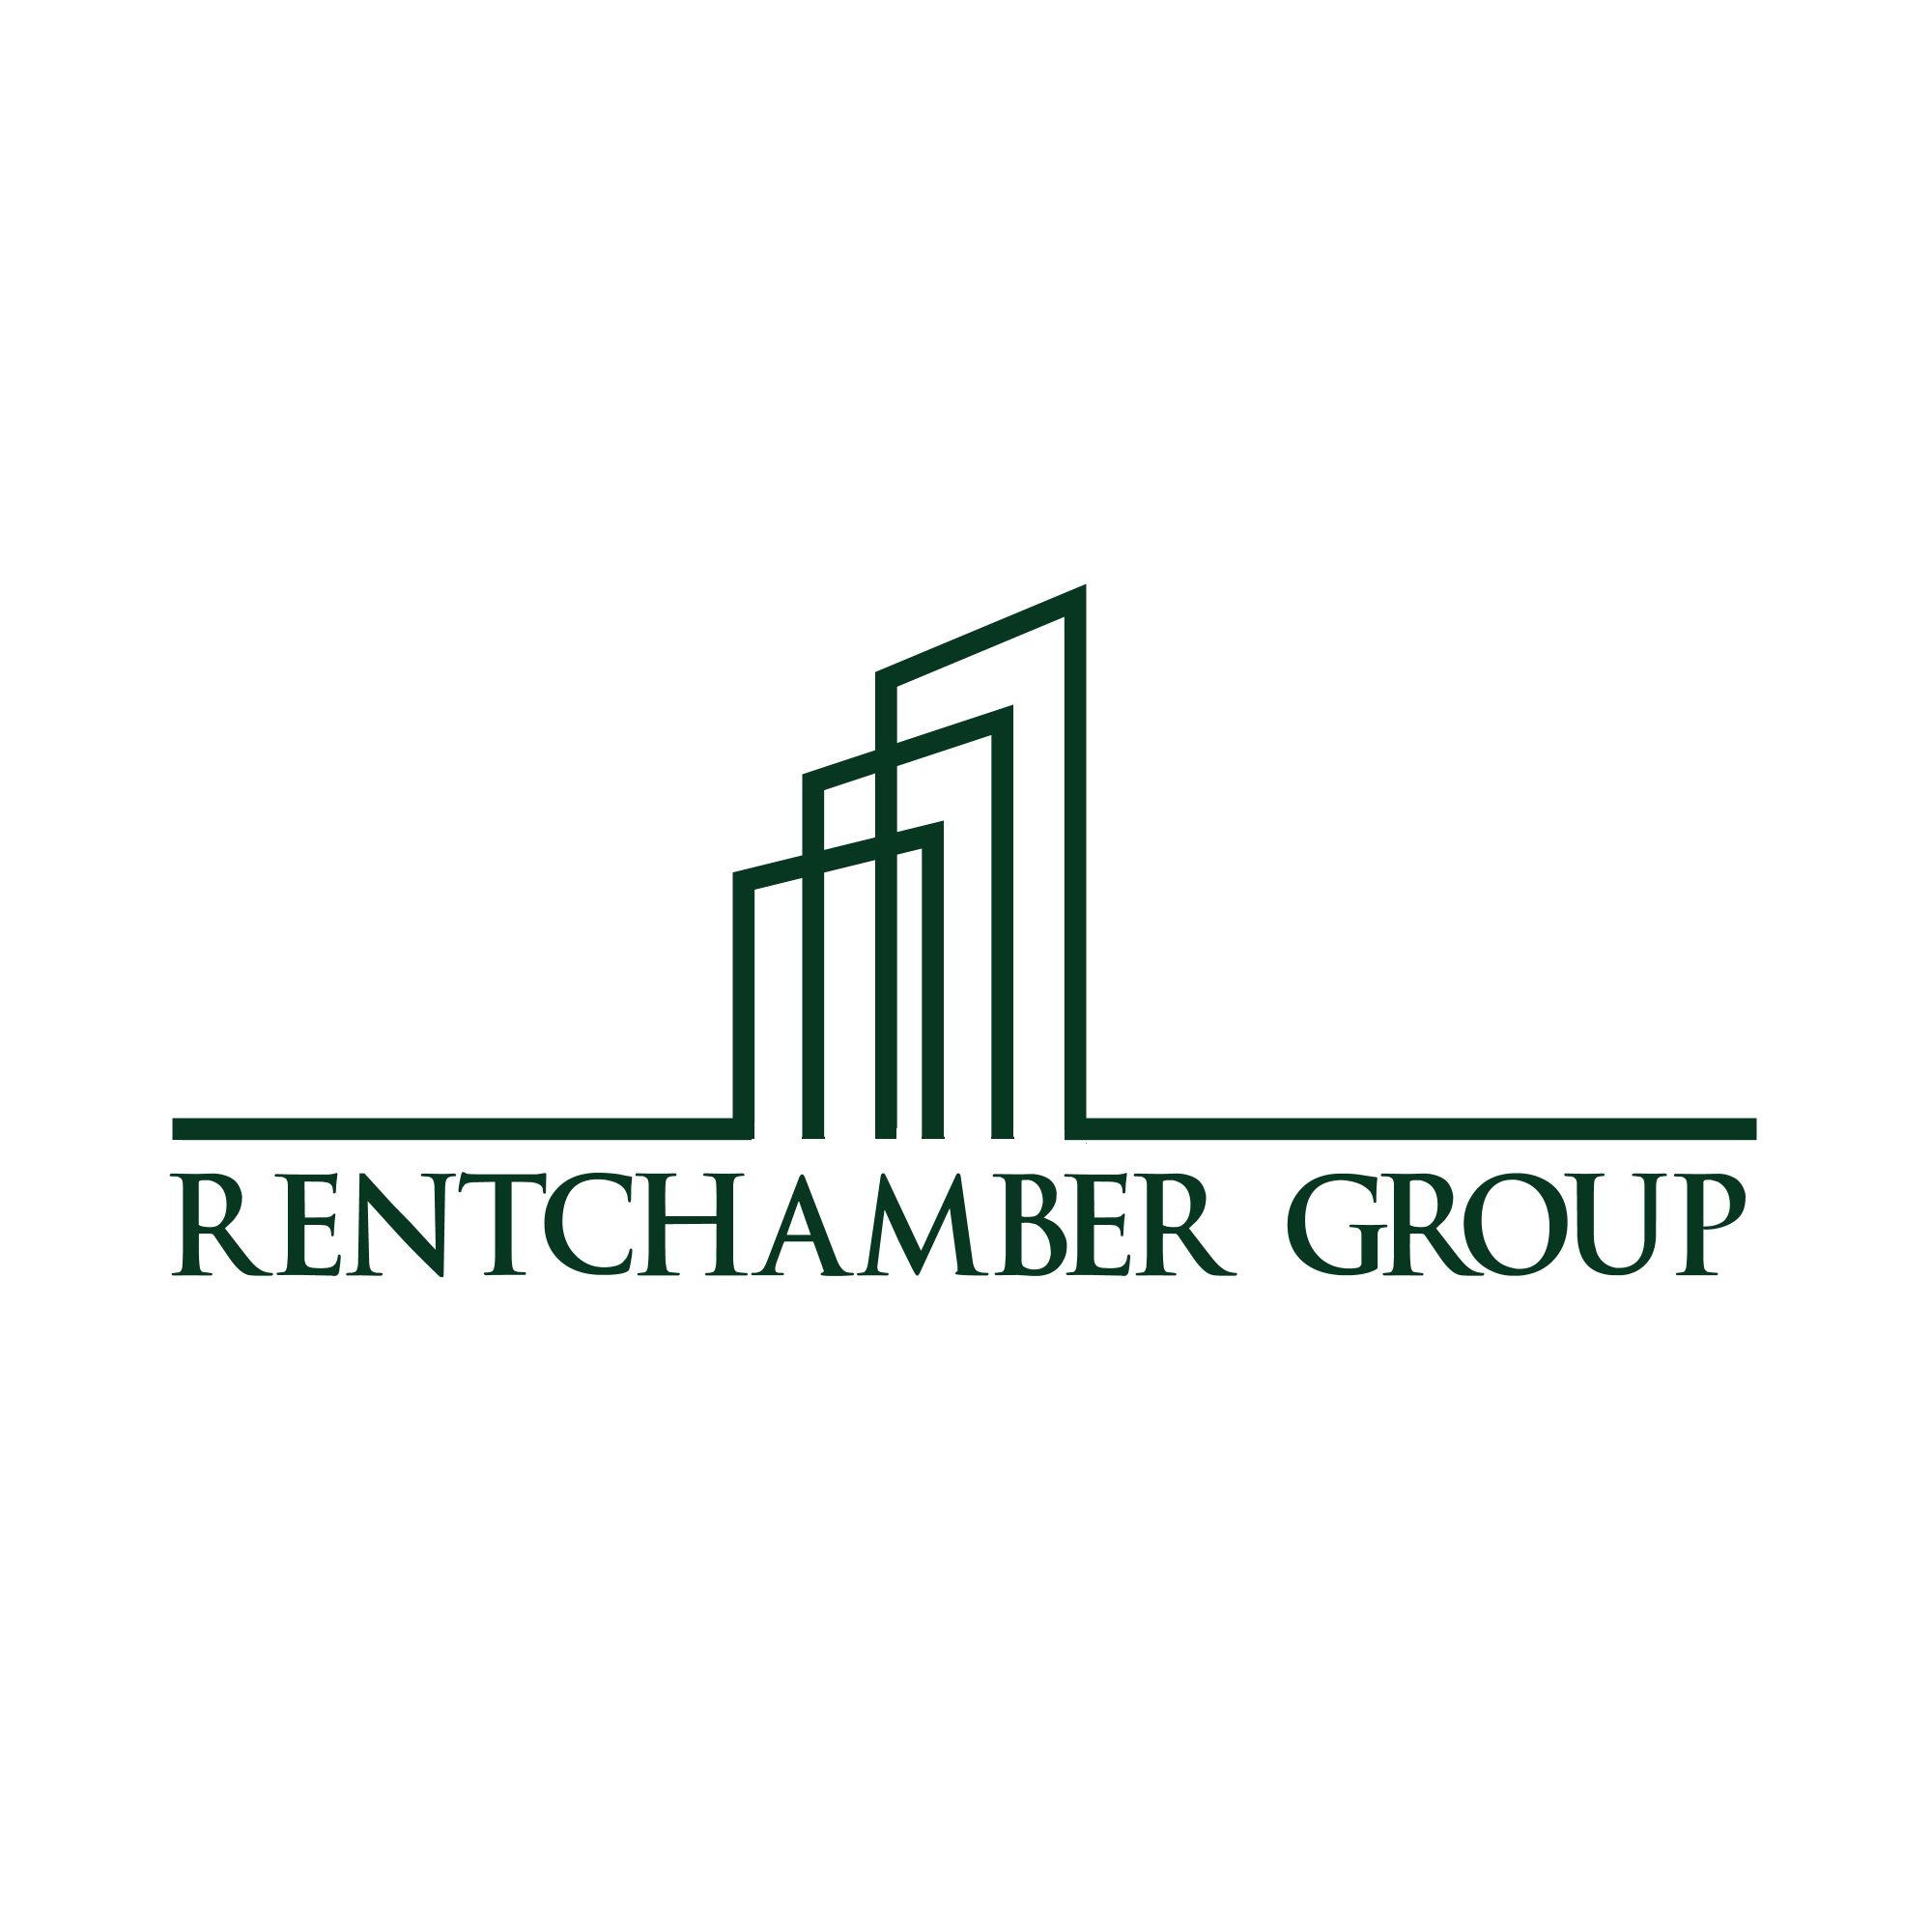 Rentchamber